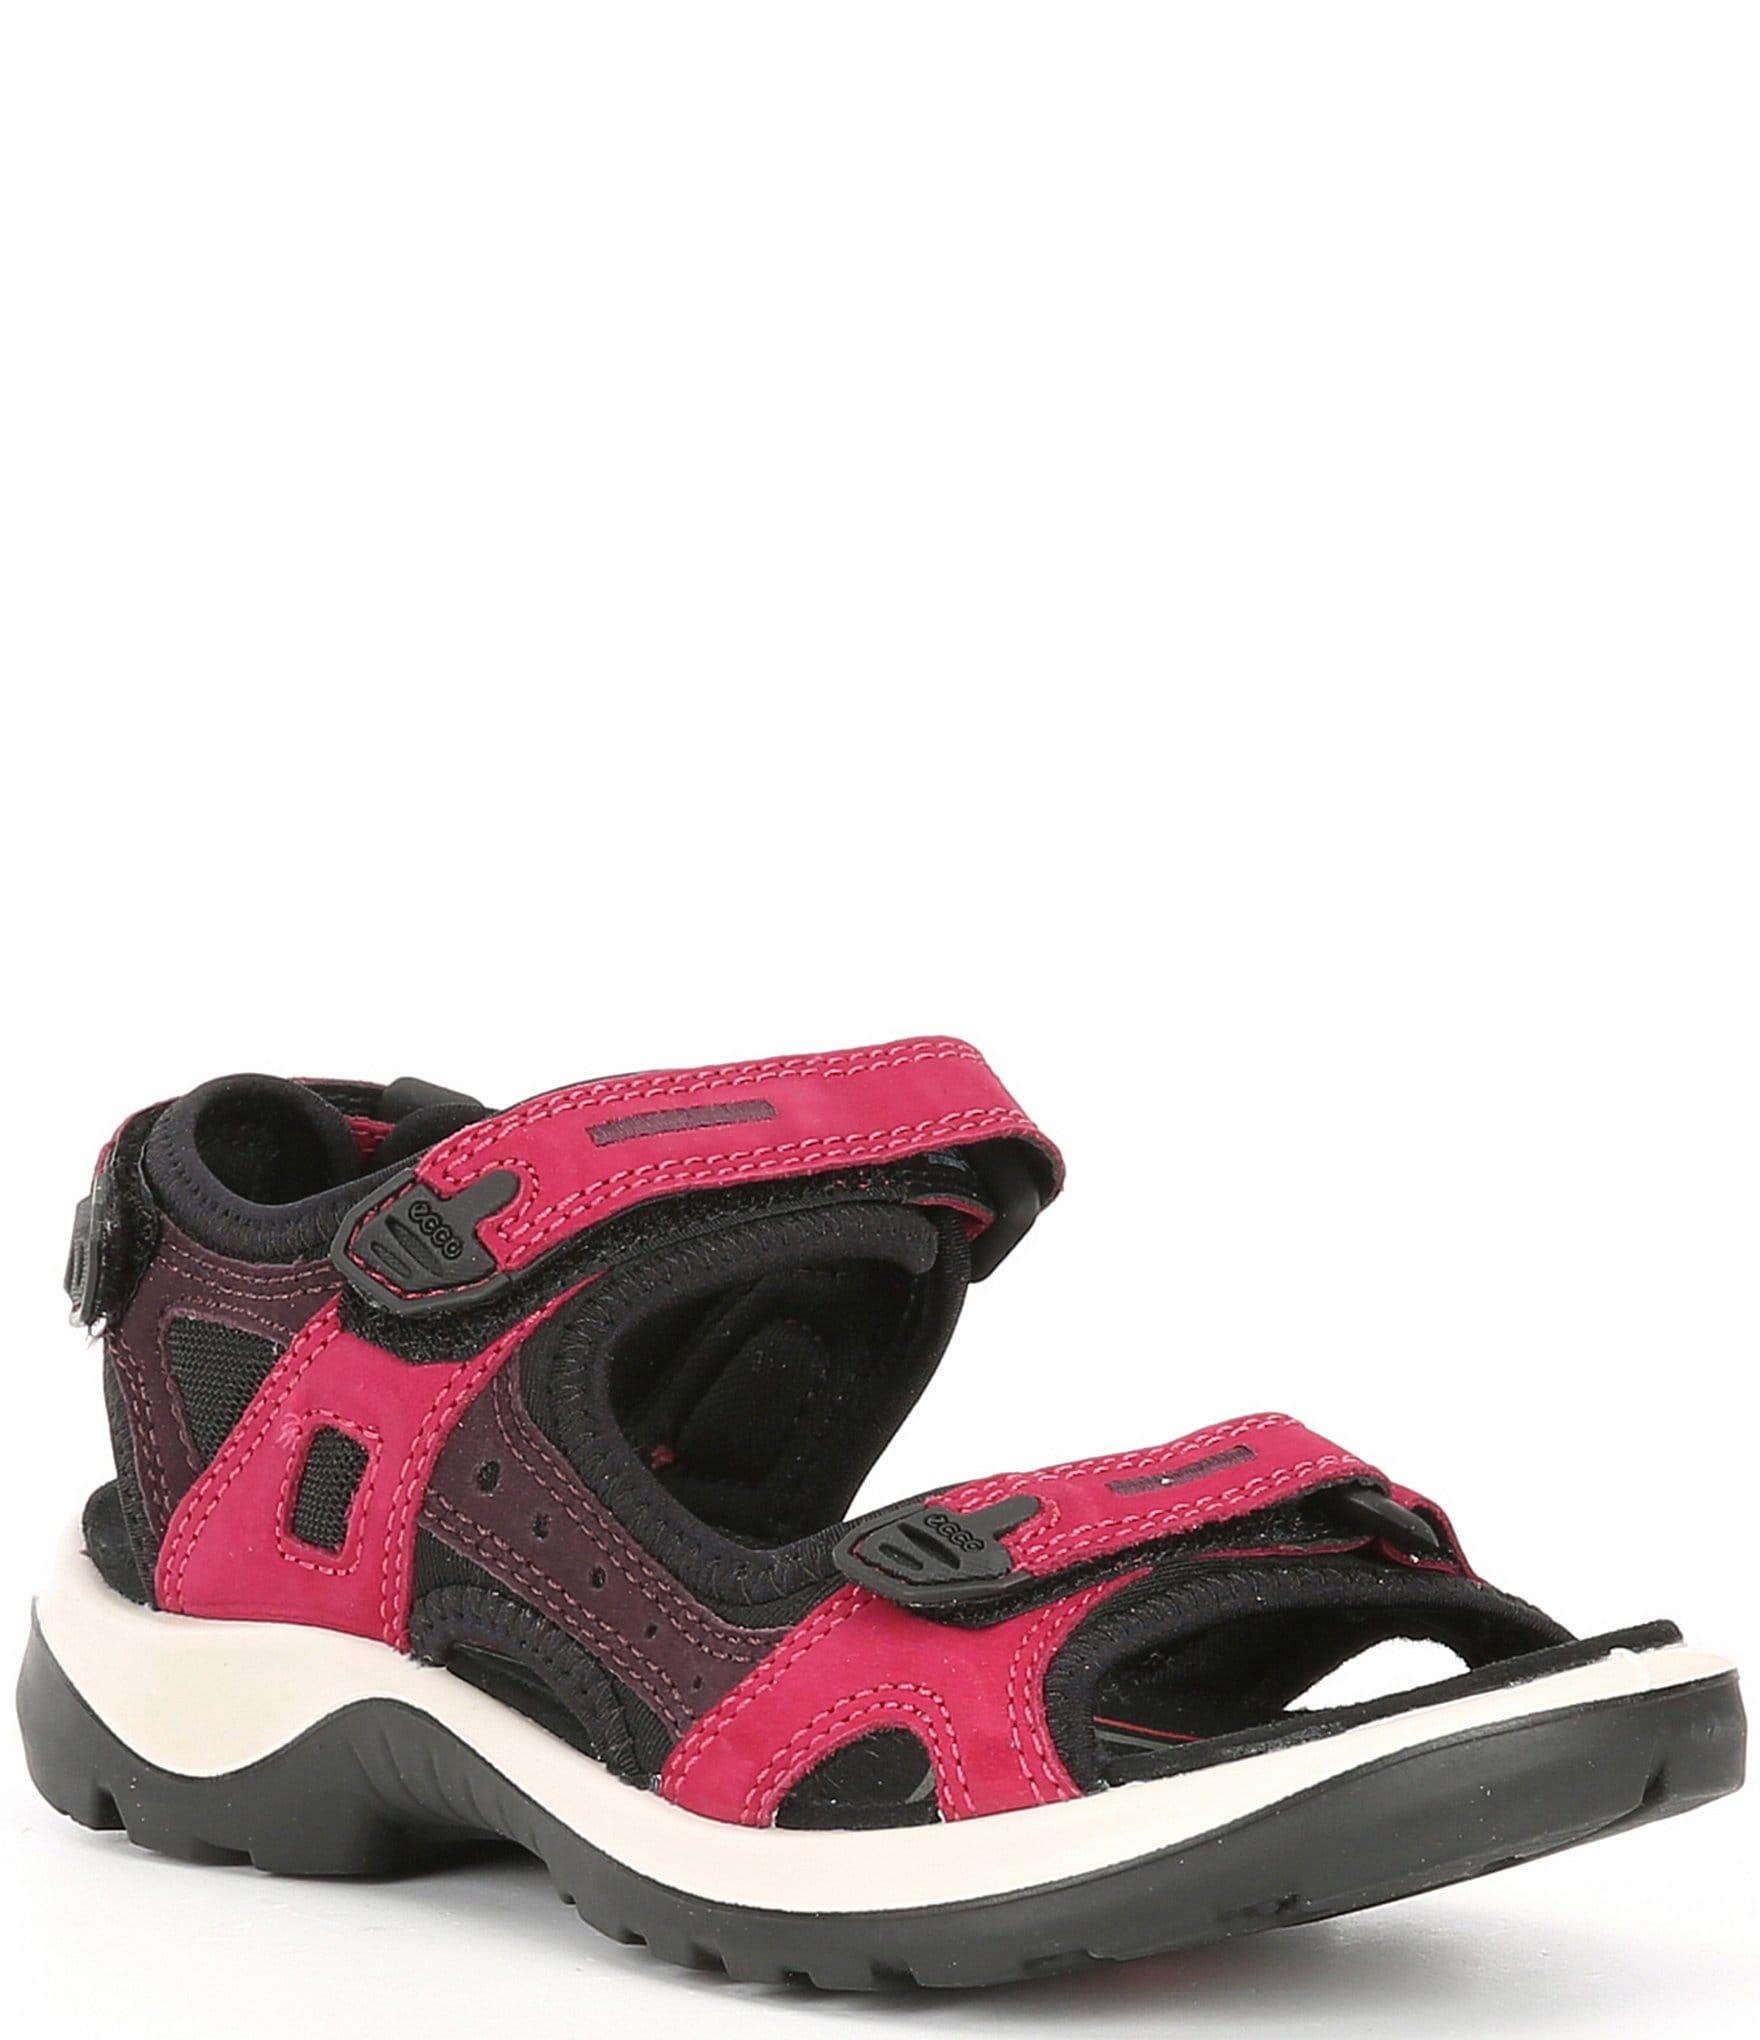 ECCO Women's Sandals | Dillard's